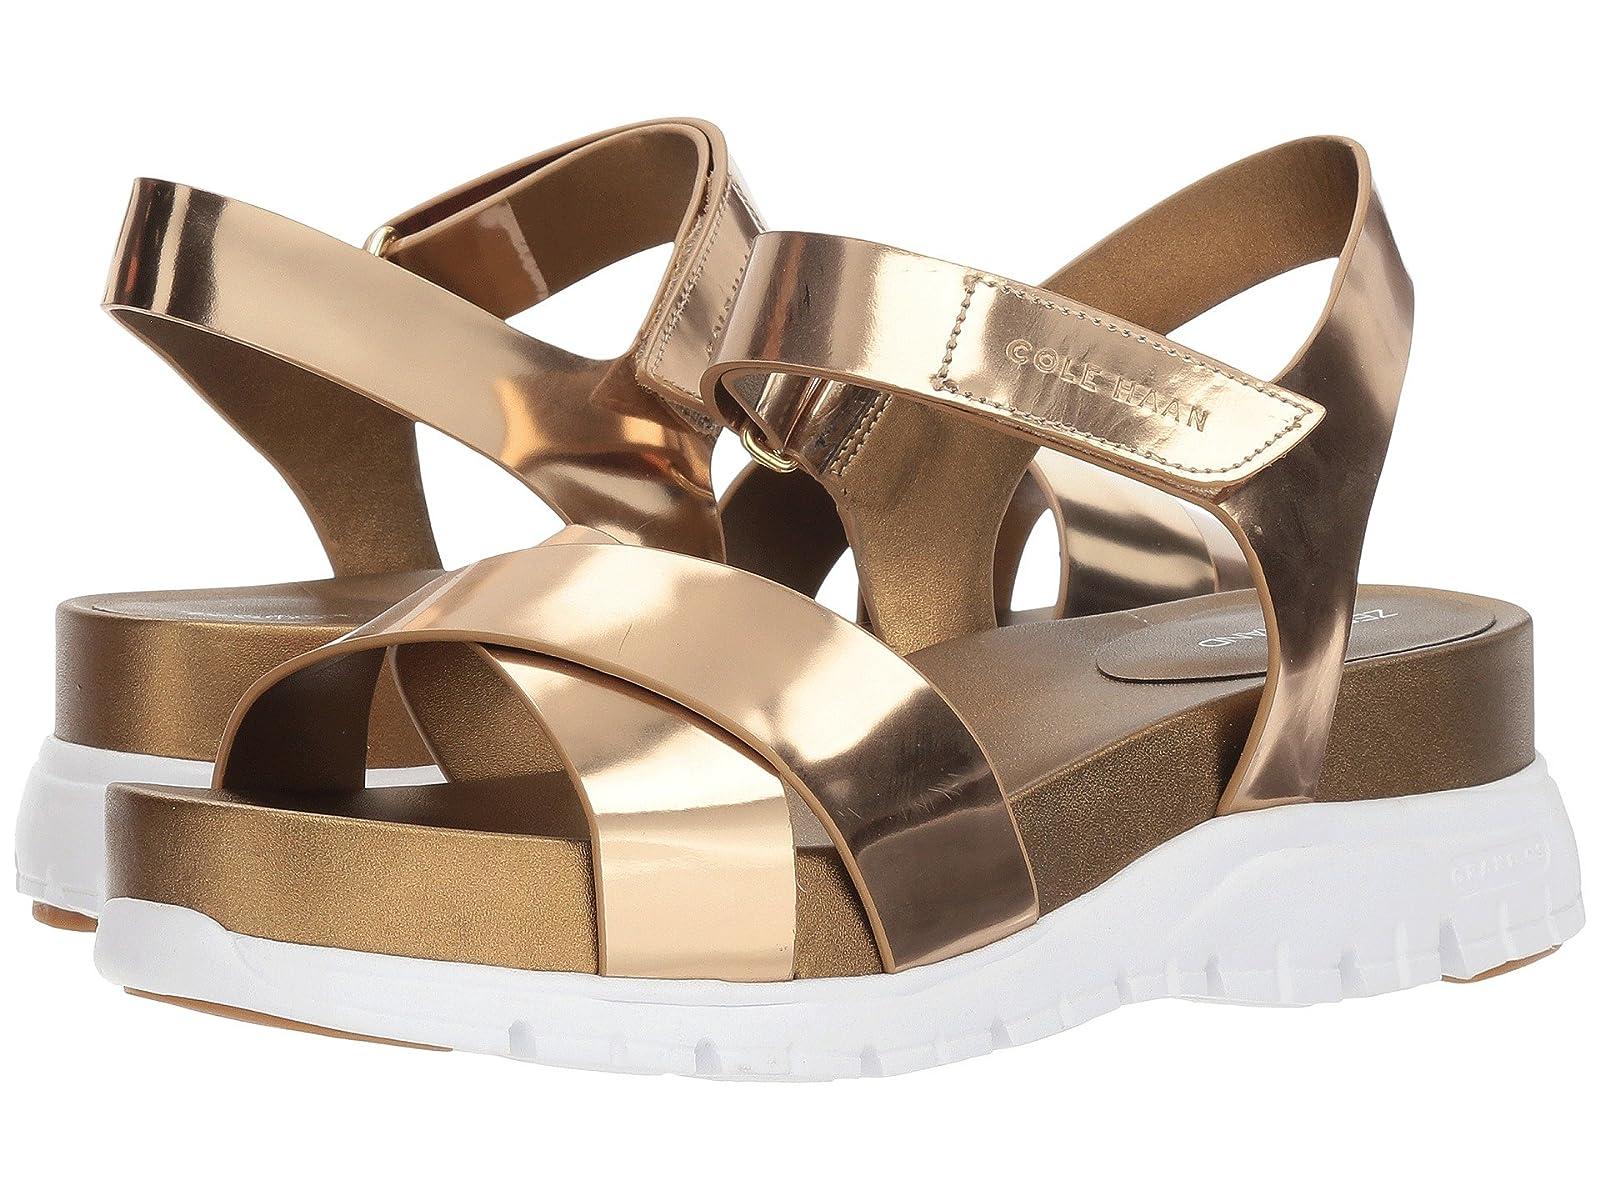 Cole Haan Zerogrand Sandal IICheap and distinctive eye-catching shoes